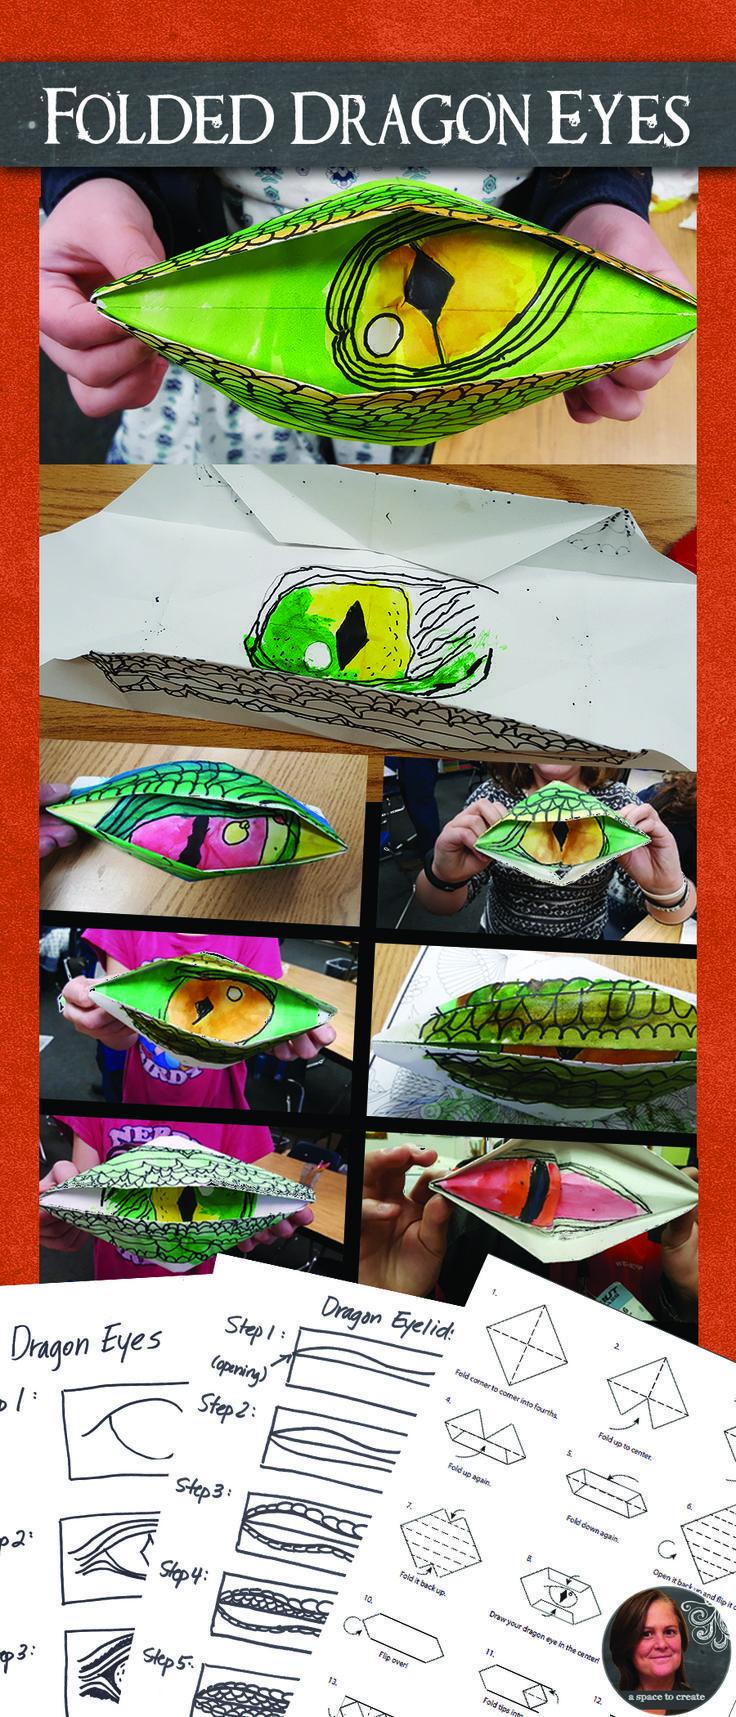 Folded Dragon Eye Art Lektion, sehr ansprechende Lektion für Kinder der oberen Grundstufe